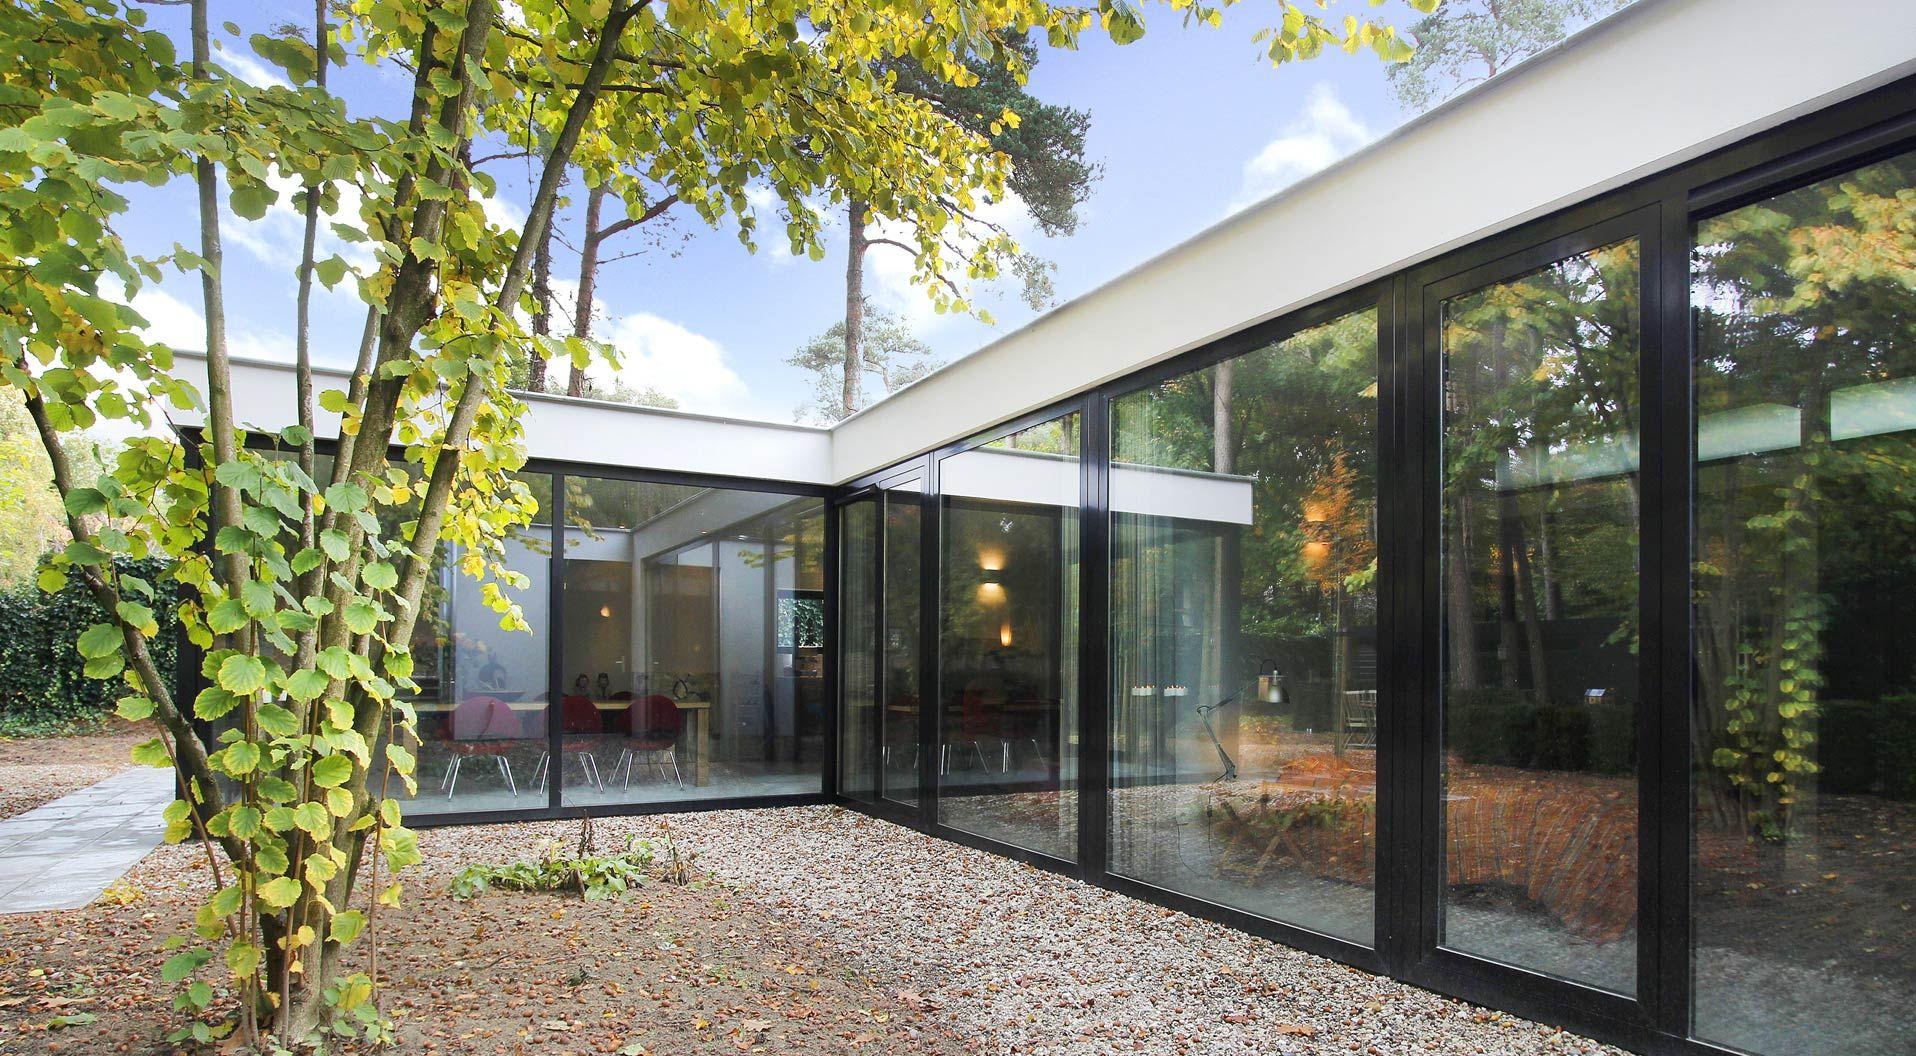 Villa helvoirt architectuur otten van eck arquitetura